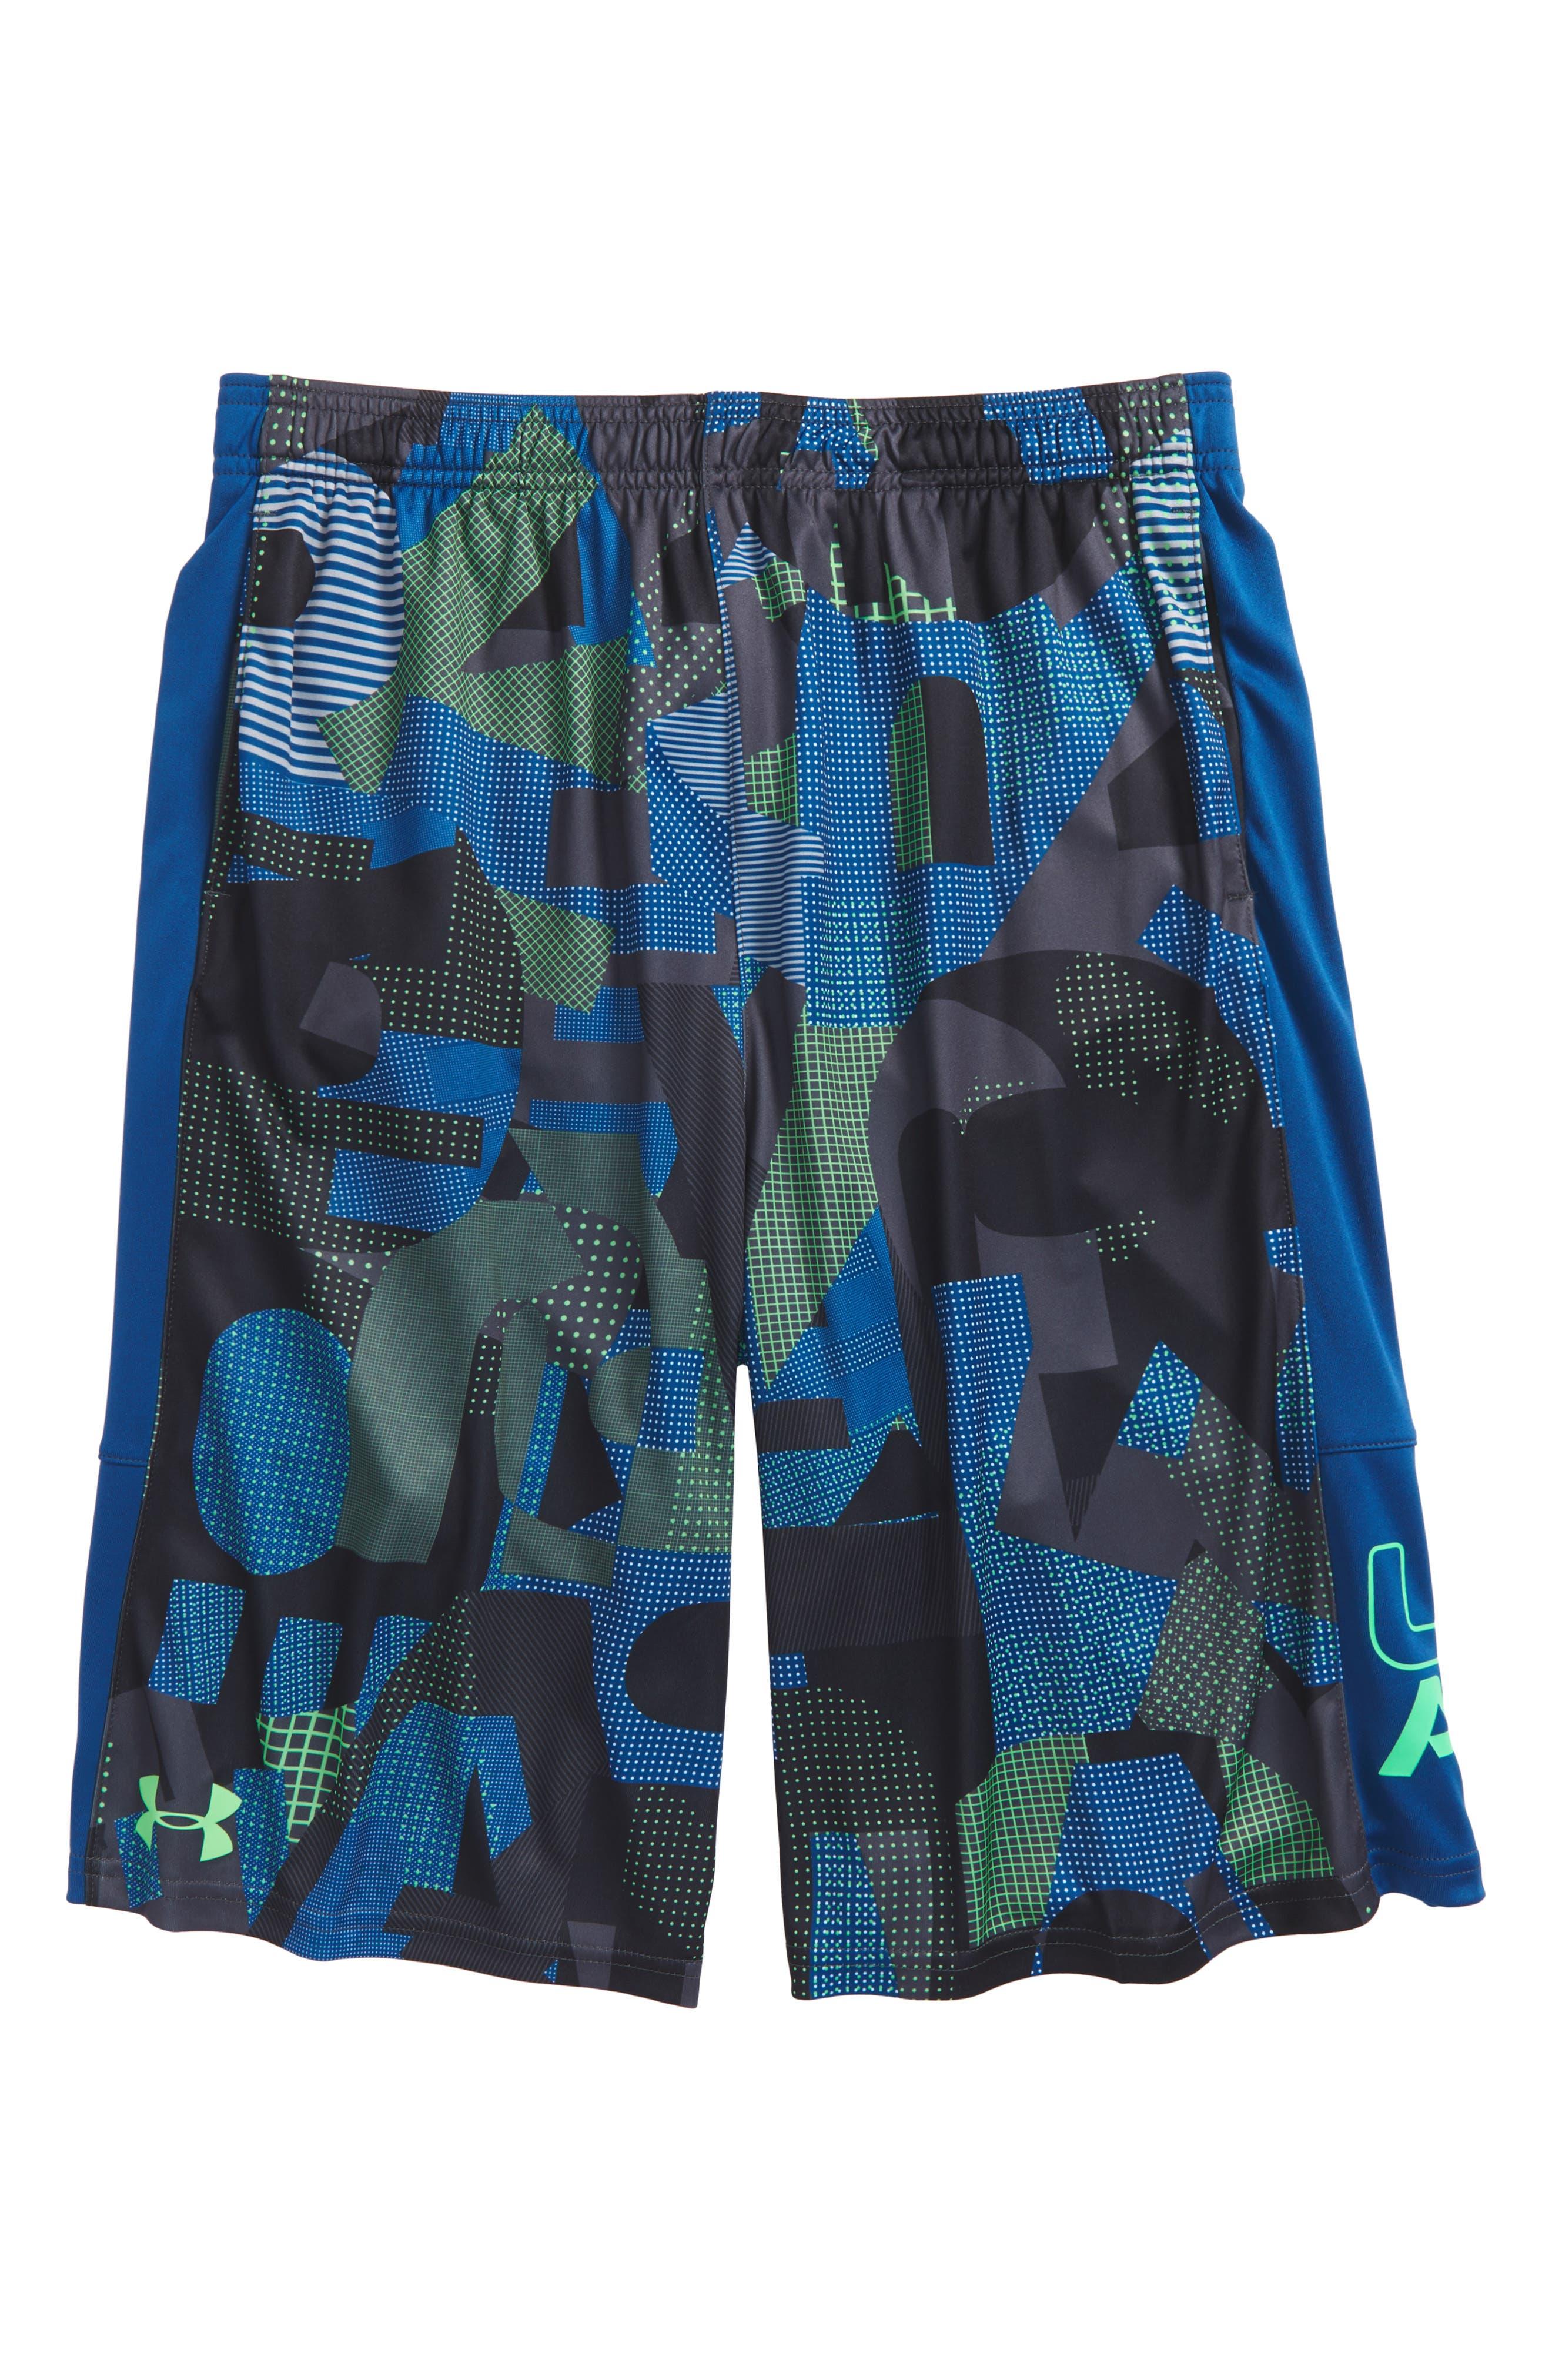 Stunt HeatGear<sup>®</sup> Shorts,                             Main thumbnail 1, color,                             ARENA GREEN/ MOROCCAN BLUE